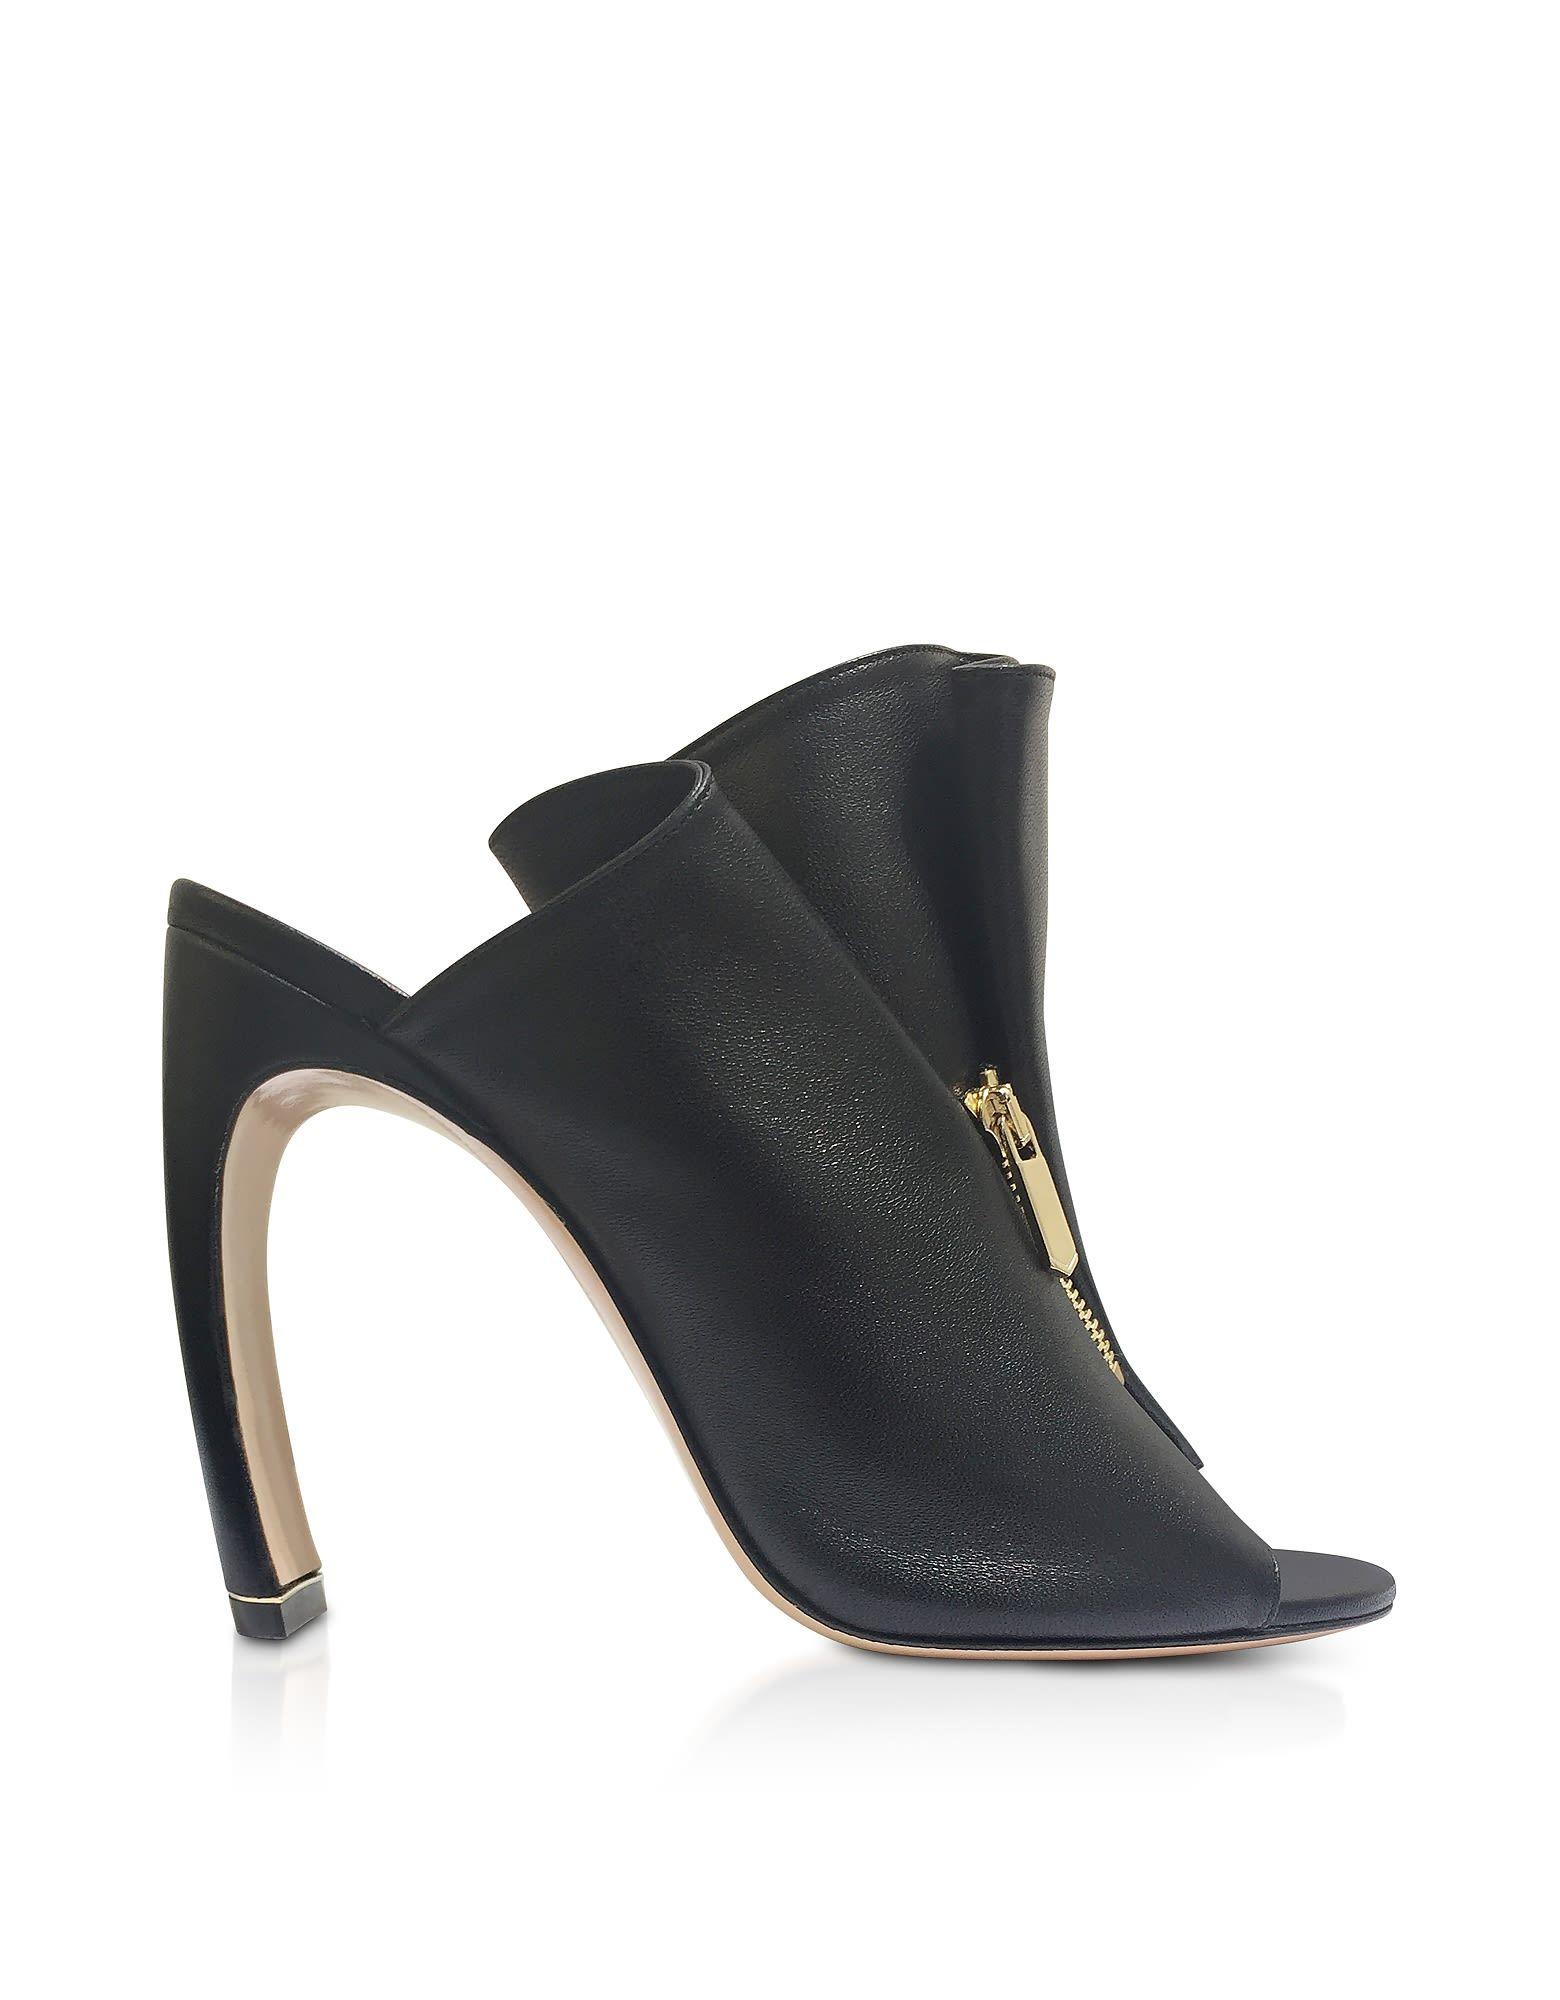 Nicholas Kirkwood Designer Shoes, Nappa 105mm Kristen High Heel Mules